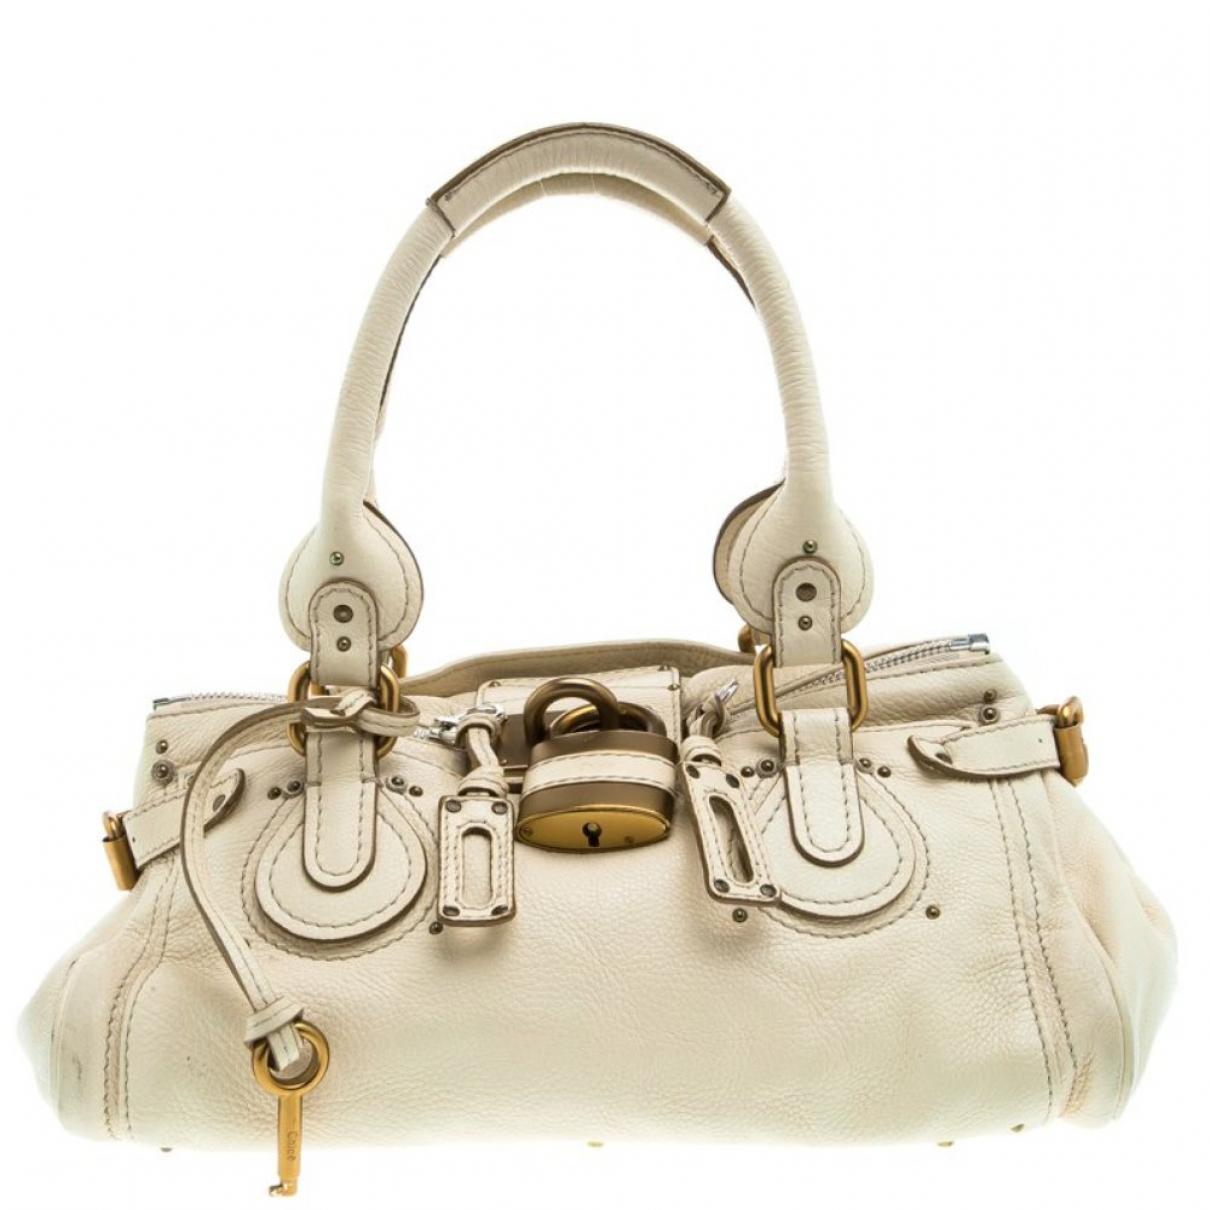 Chloé \N Leather handbag for Women \N